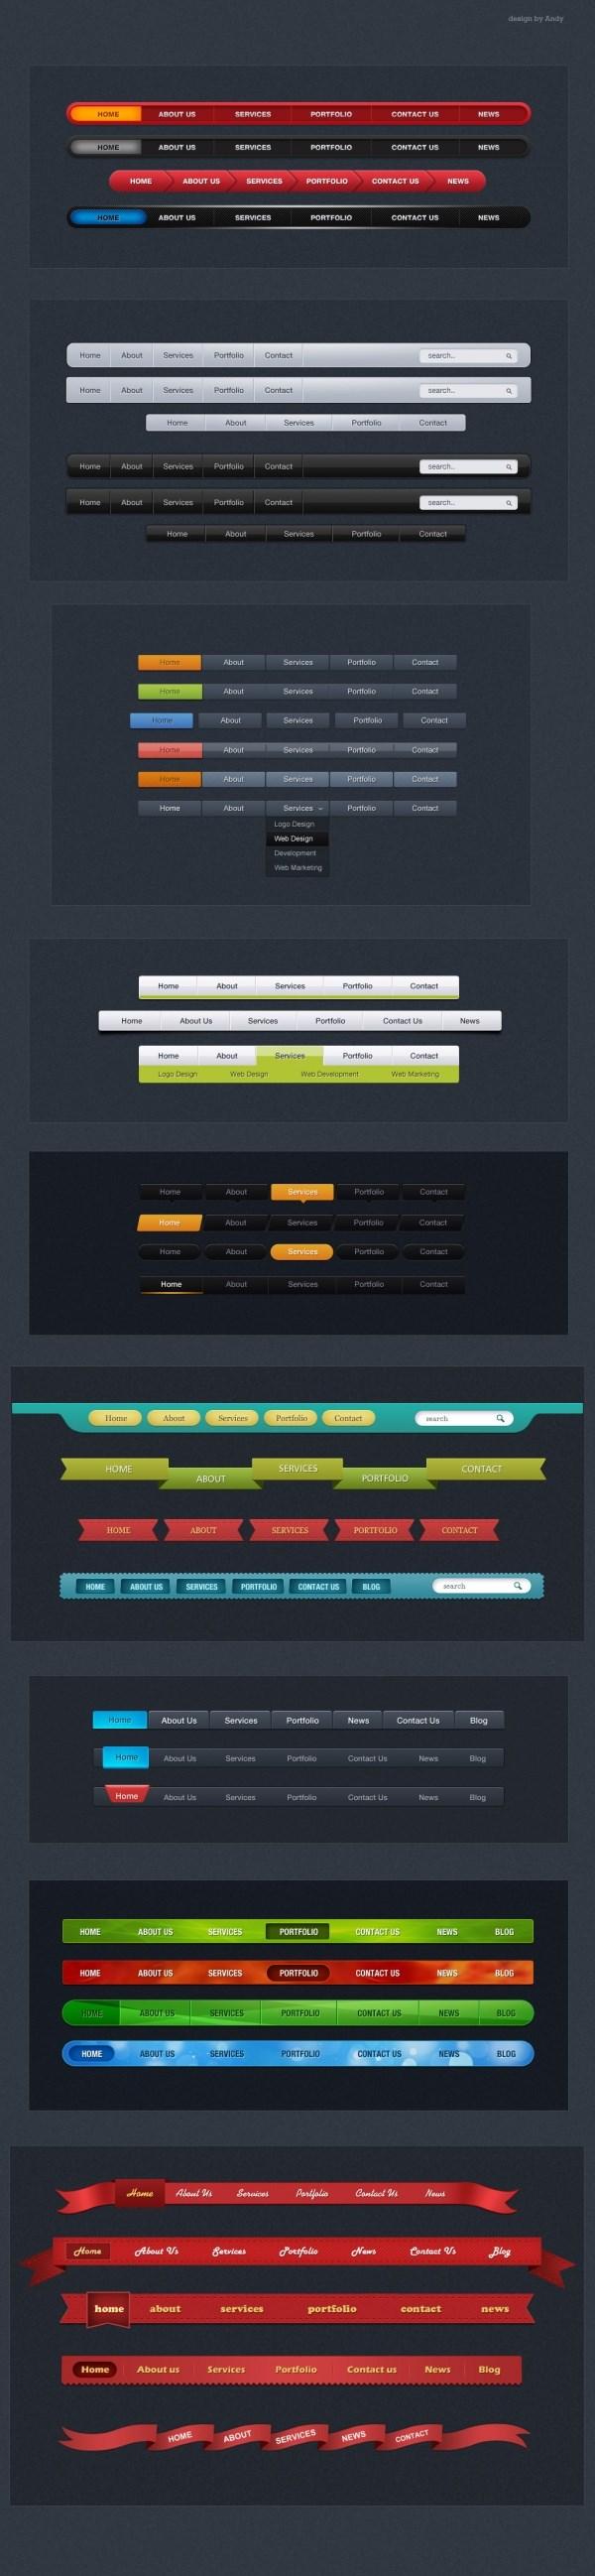 39 pages navigation bar designs PSD